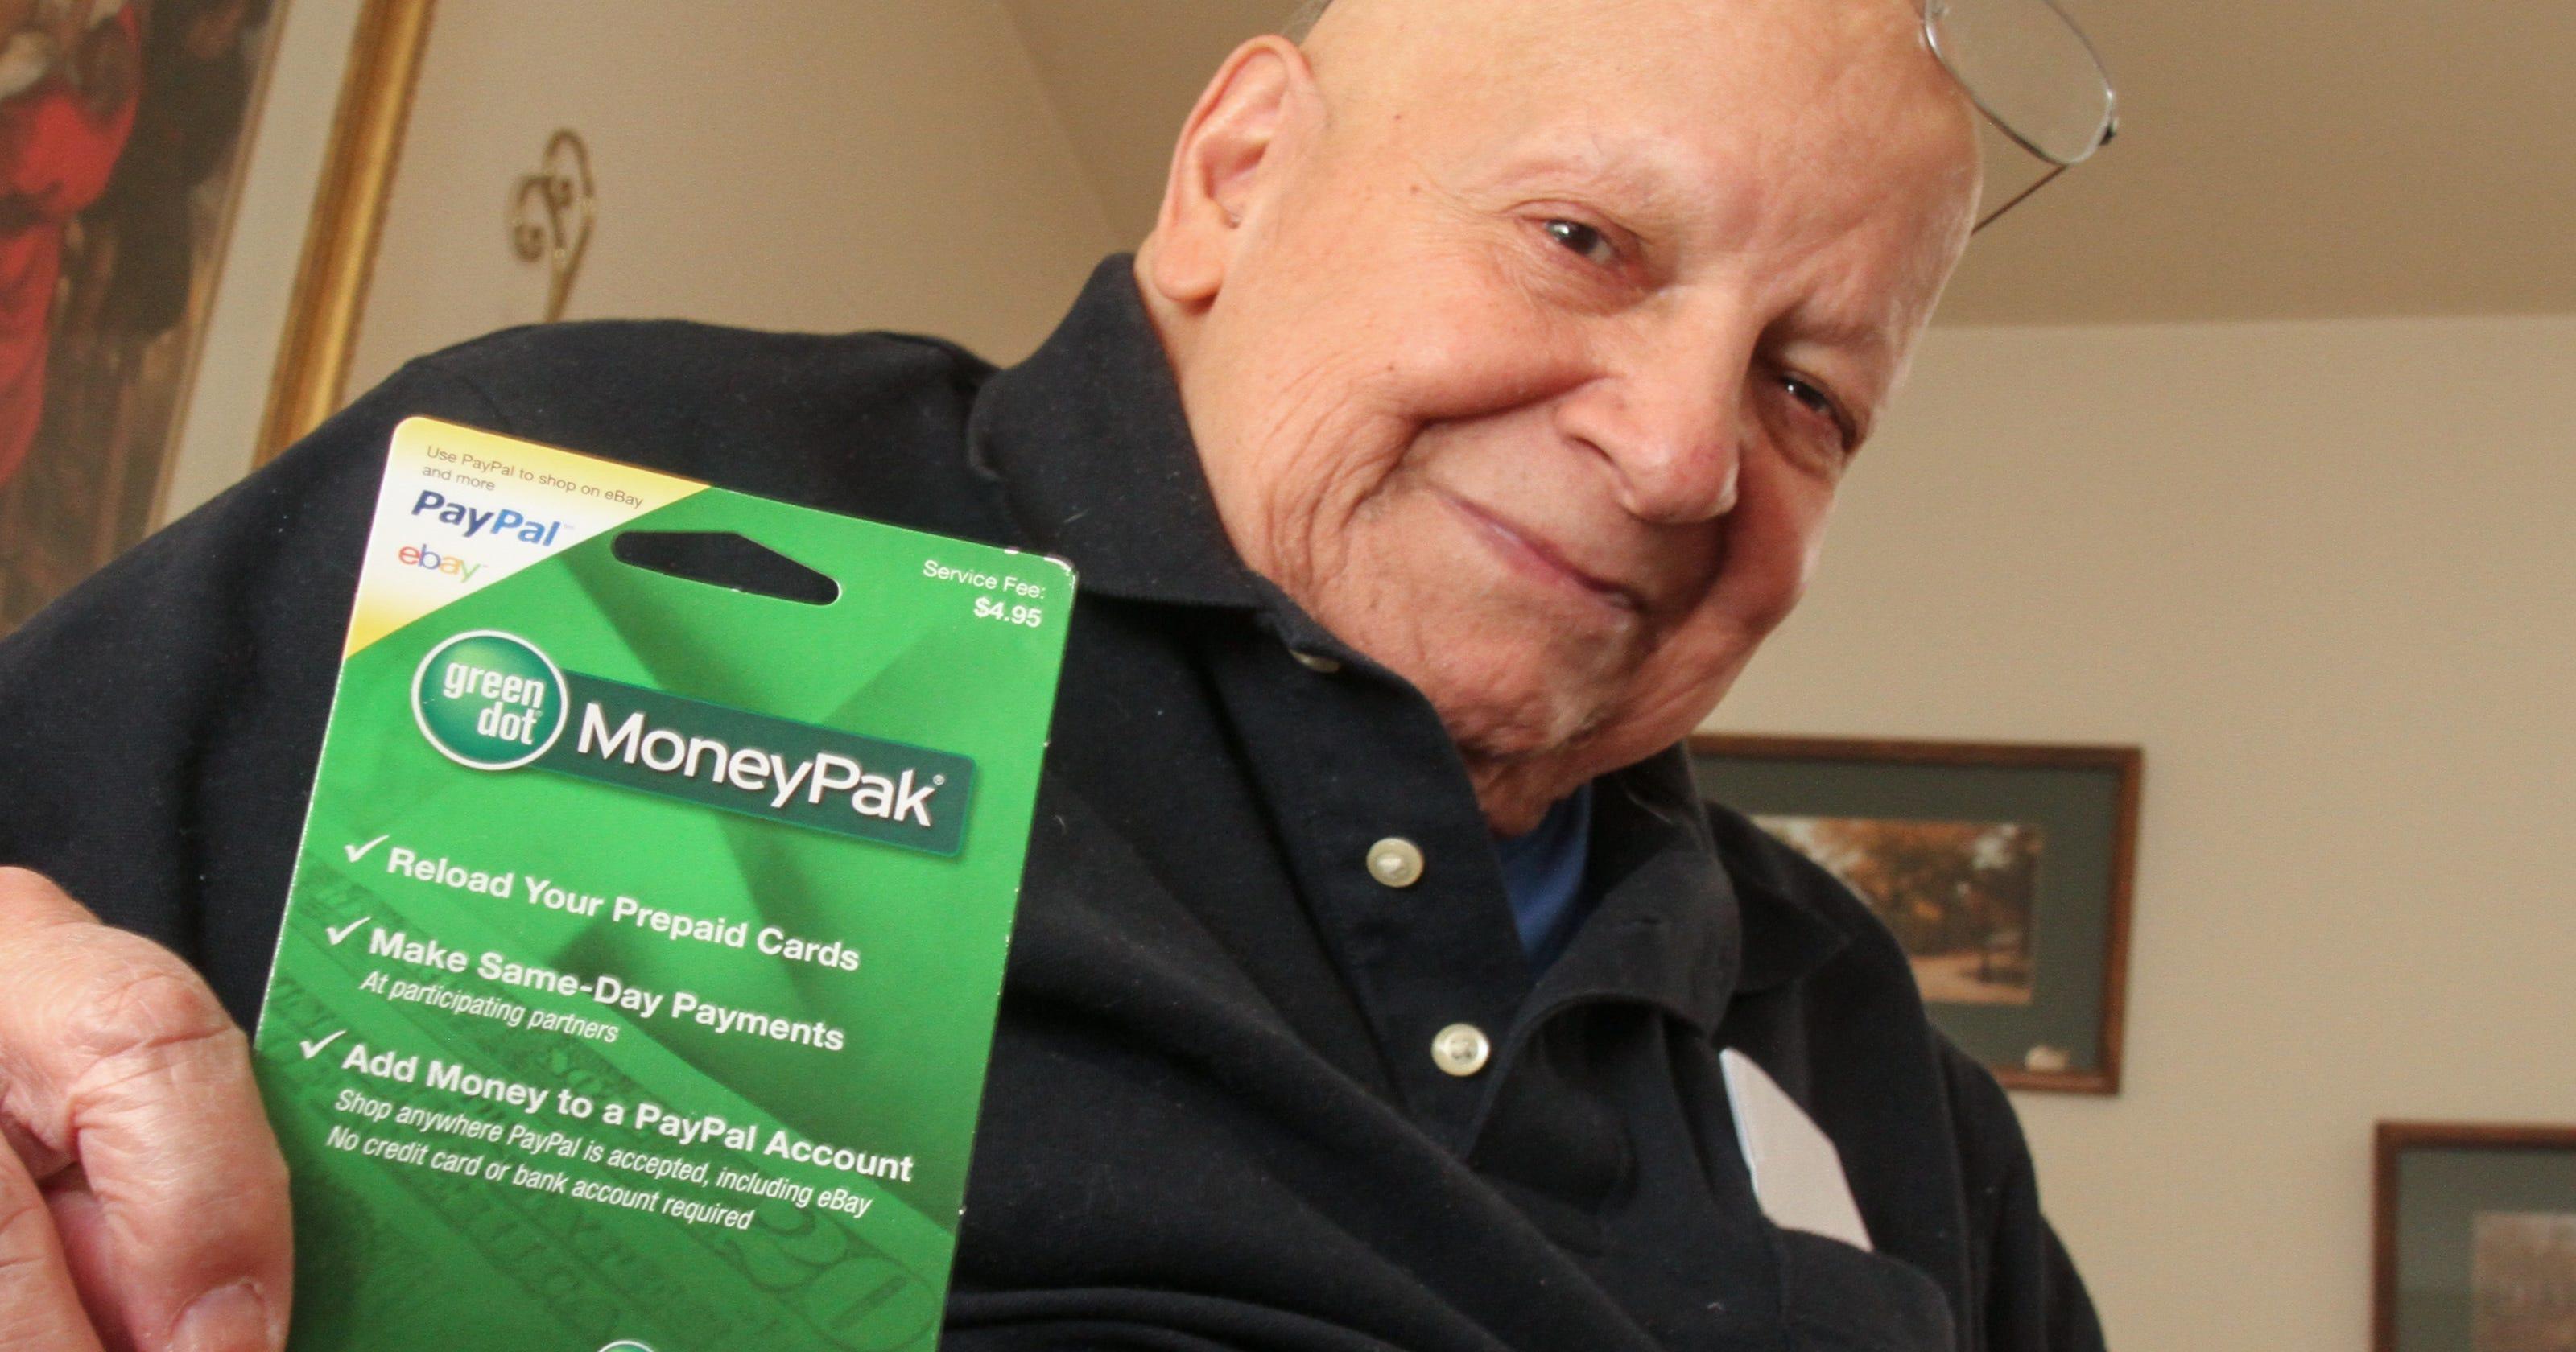 green dot moneypak where did mans 500 go - Prepaid Cards That Accept Moneypak